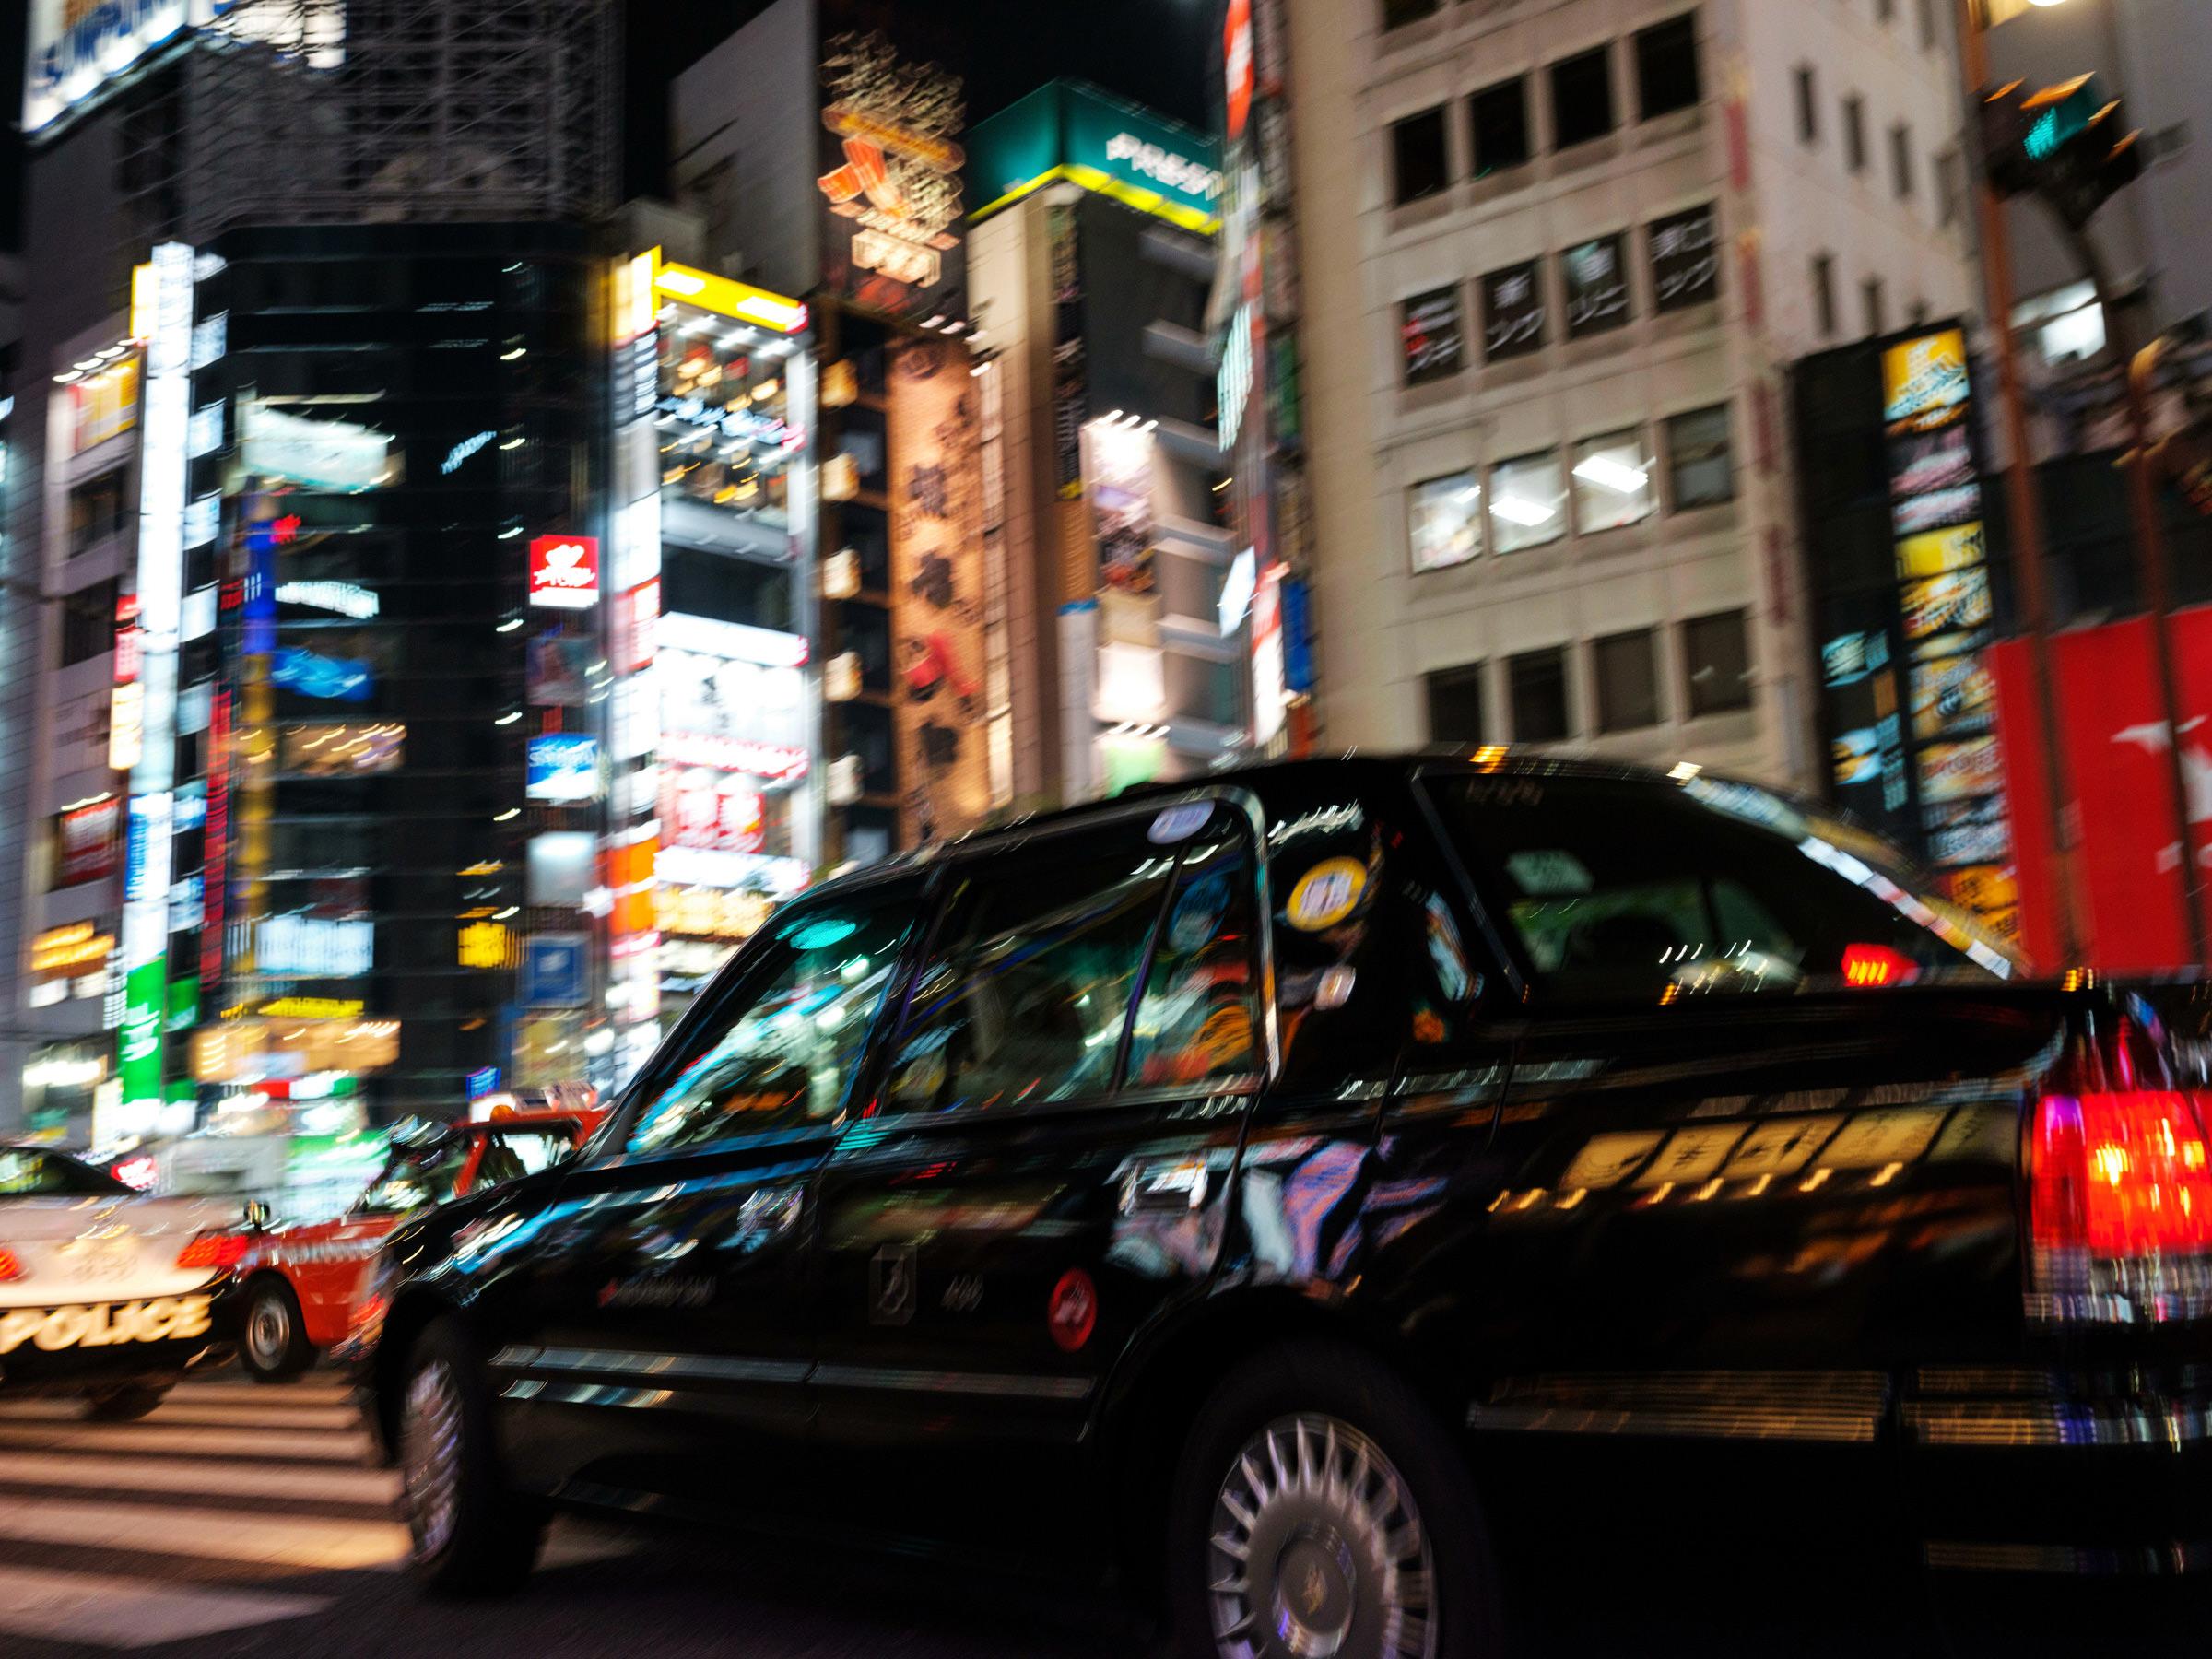 Fujifilm-GFX-Japan-Street-Photography-31